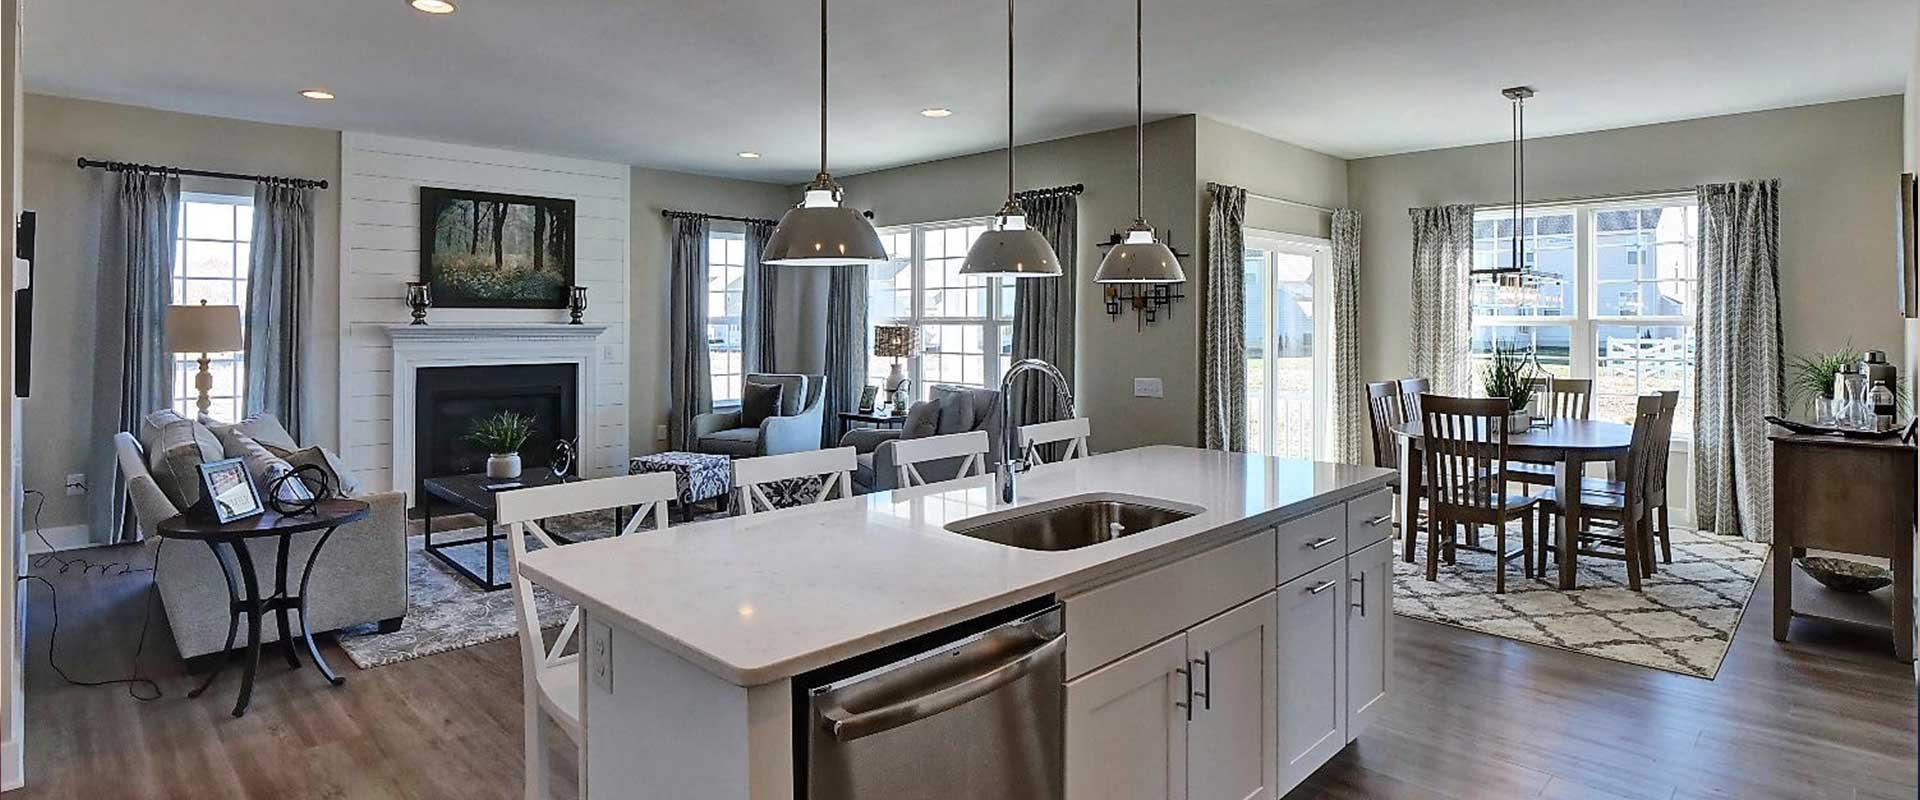 New Homes Delaware Homes In Middletown De Area Handler Homes